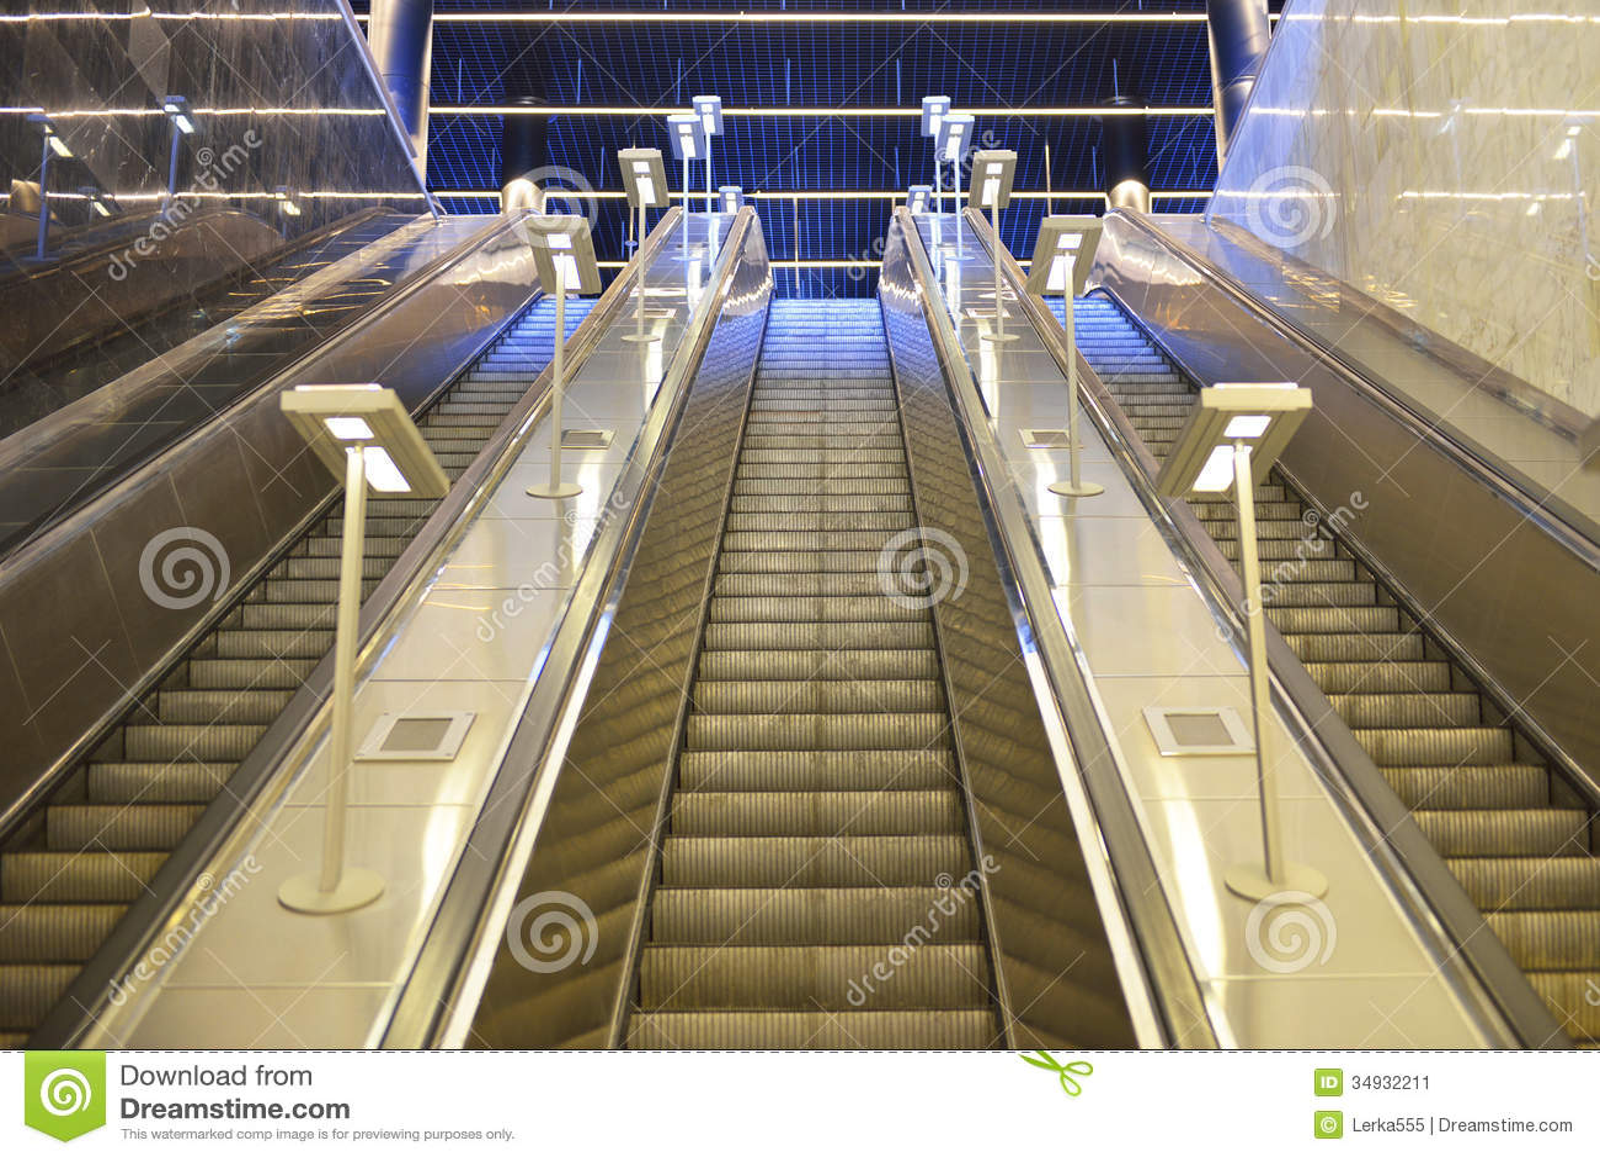 Moscow Metro Escalator Stock Image Image Of Futuristic